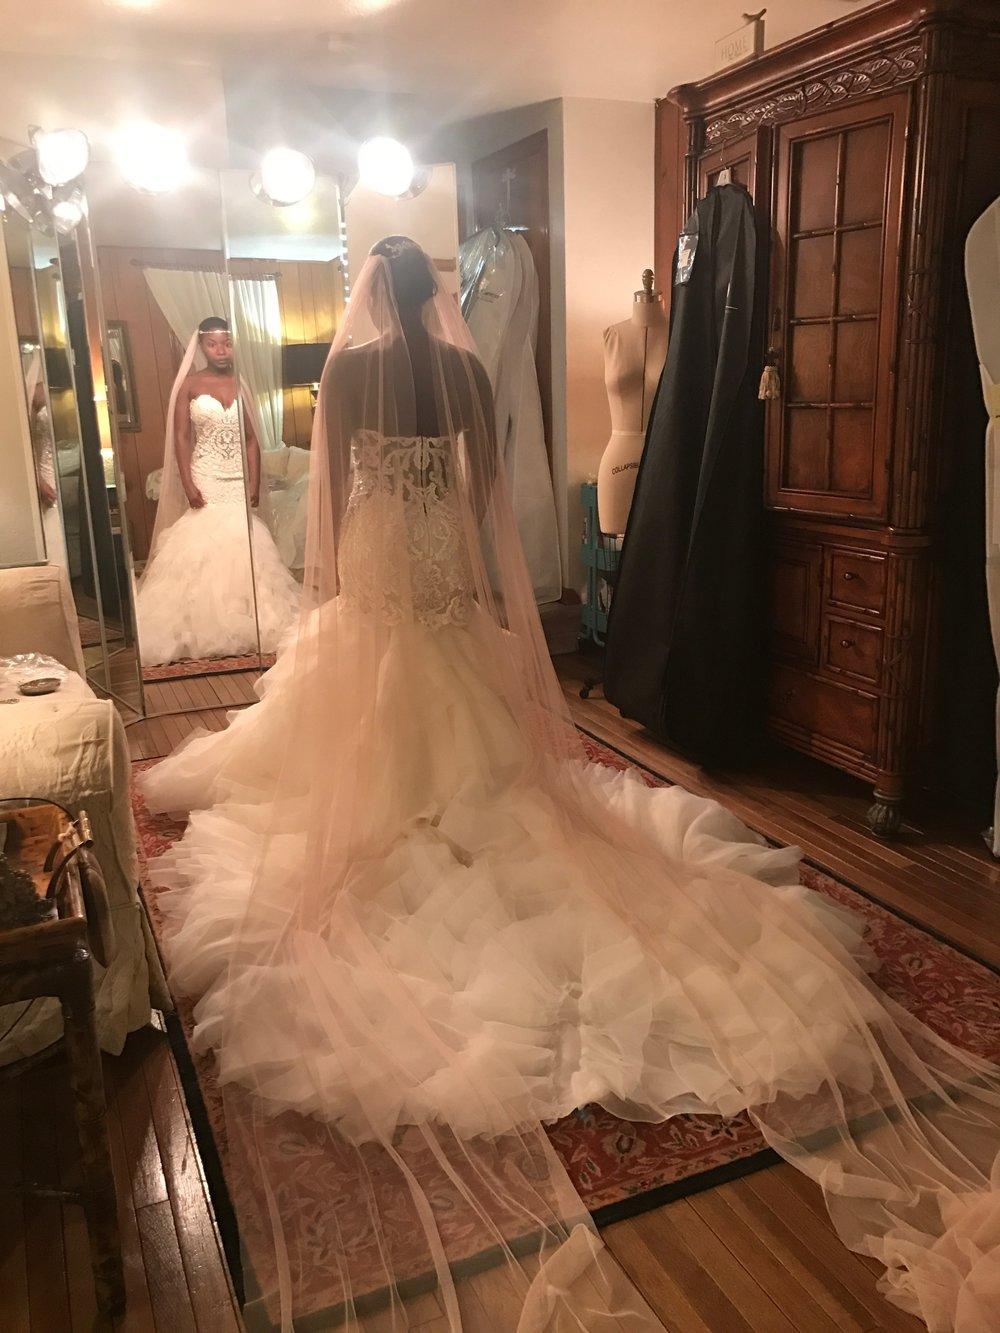 Black Destination Bride - BlackDesti Wedding Journal - Bridefriends Podcast -10 - dress fitting1 - 2 veils.JPG